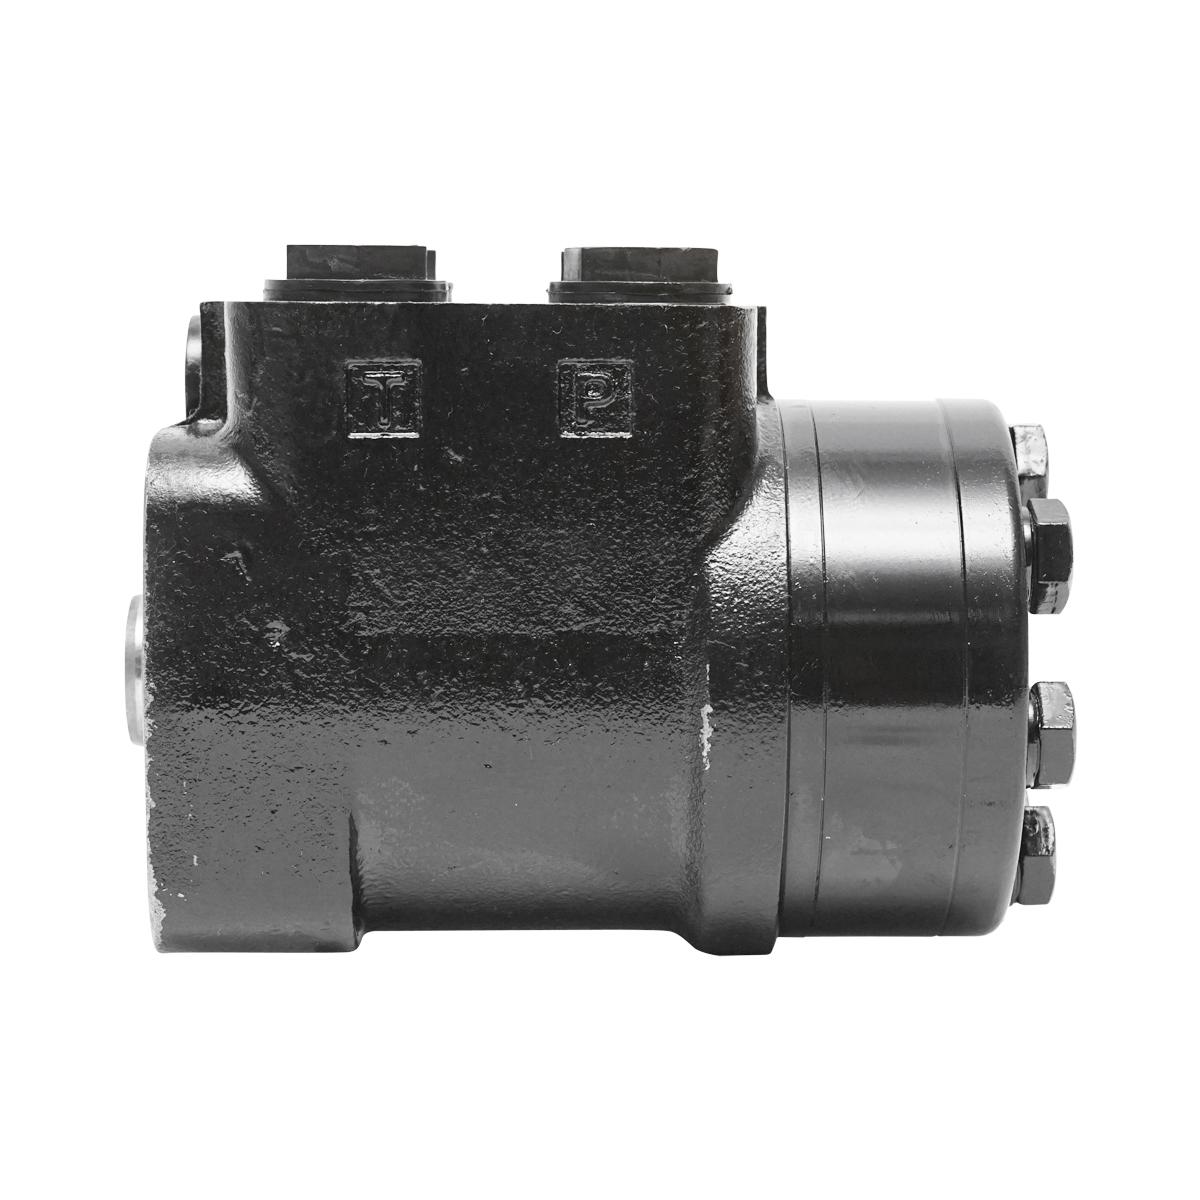 Pompa hidraulica danfoss OSPC 160 ON G1/2 (inch)  U-445 Fiat